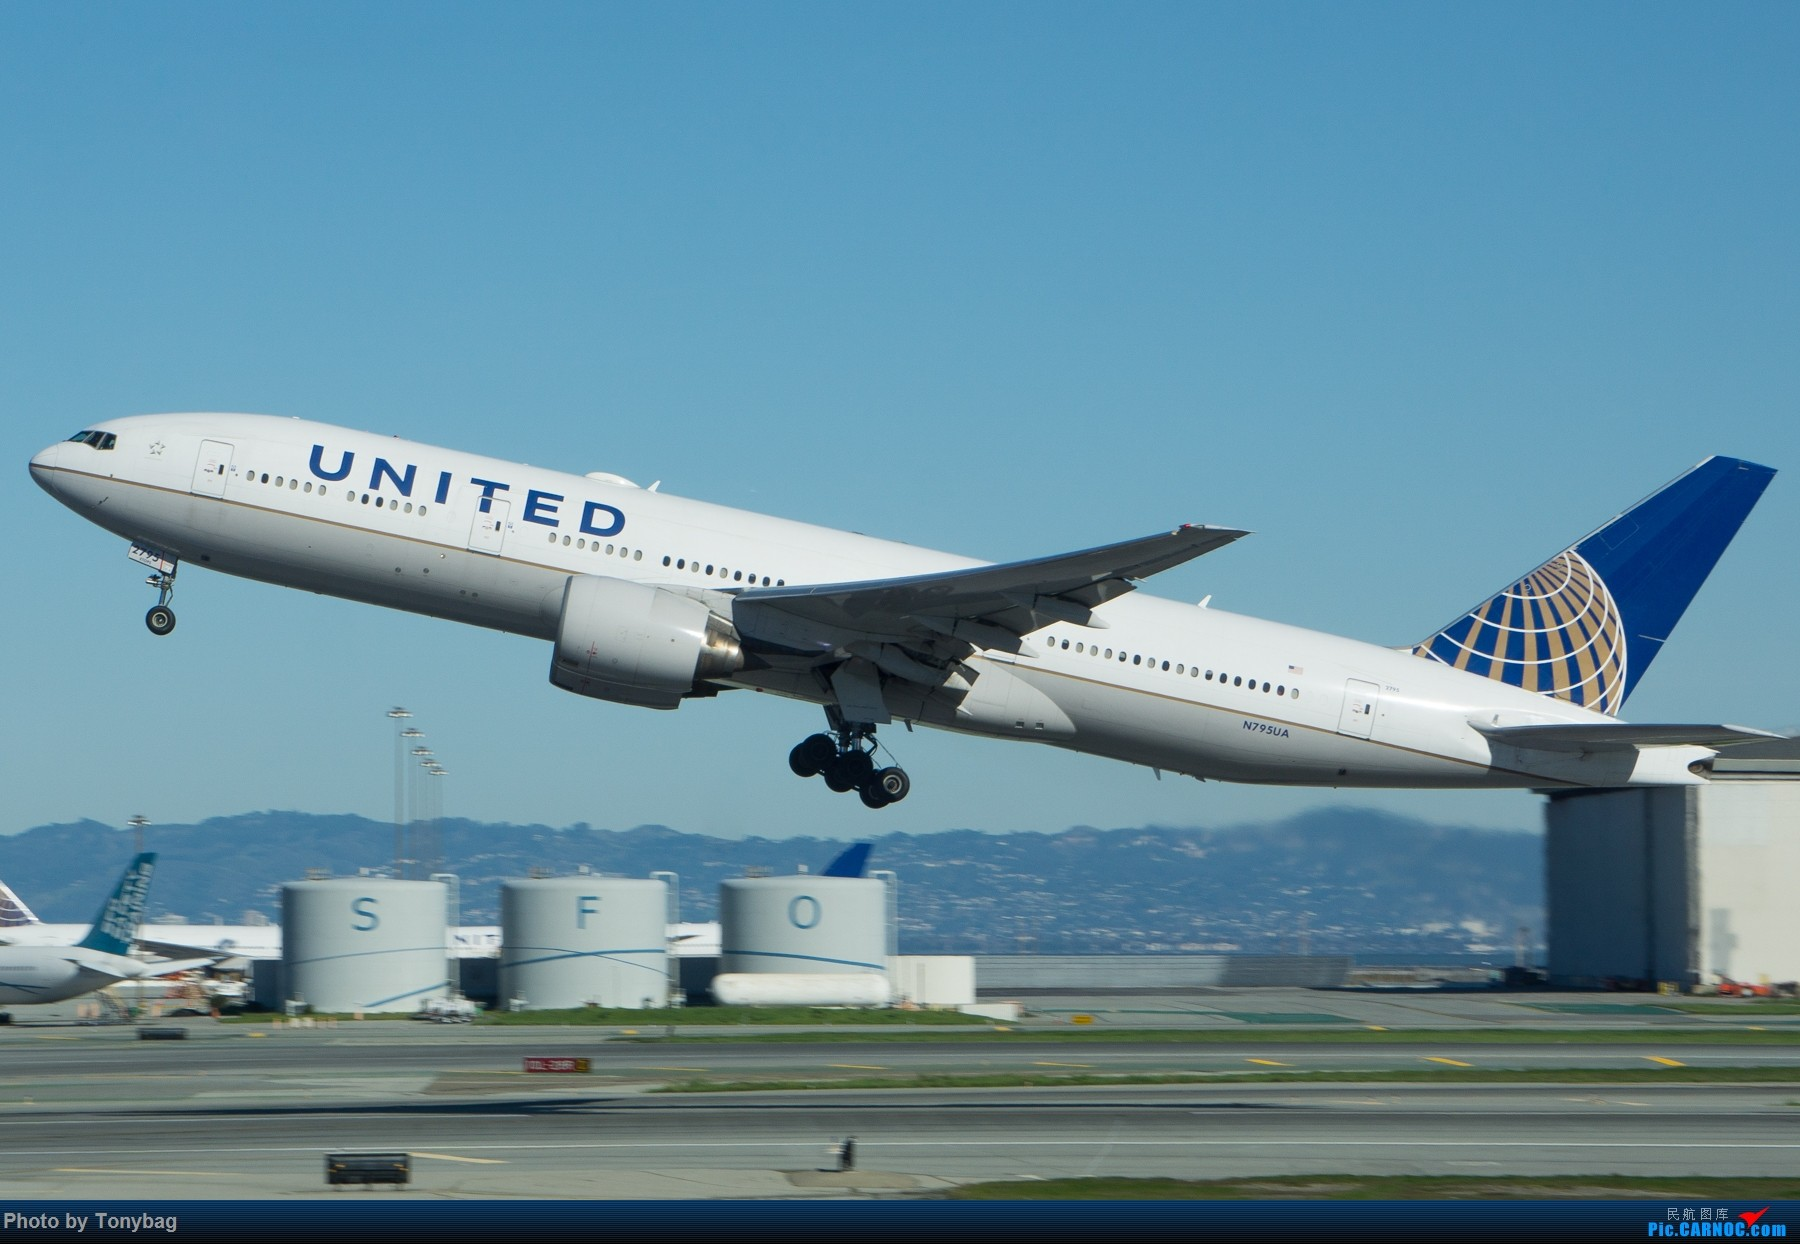 Re:[原创]【SFO】美国联合航空 Boeing 777-200ER N795UA BOEING 777-200ER N795UA 美国旧金山机场